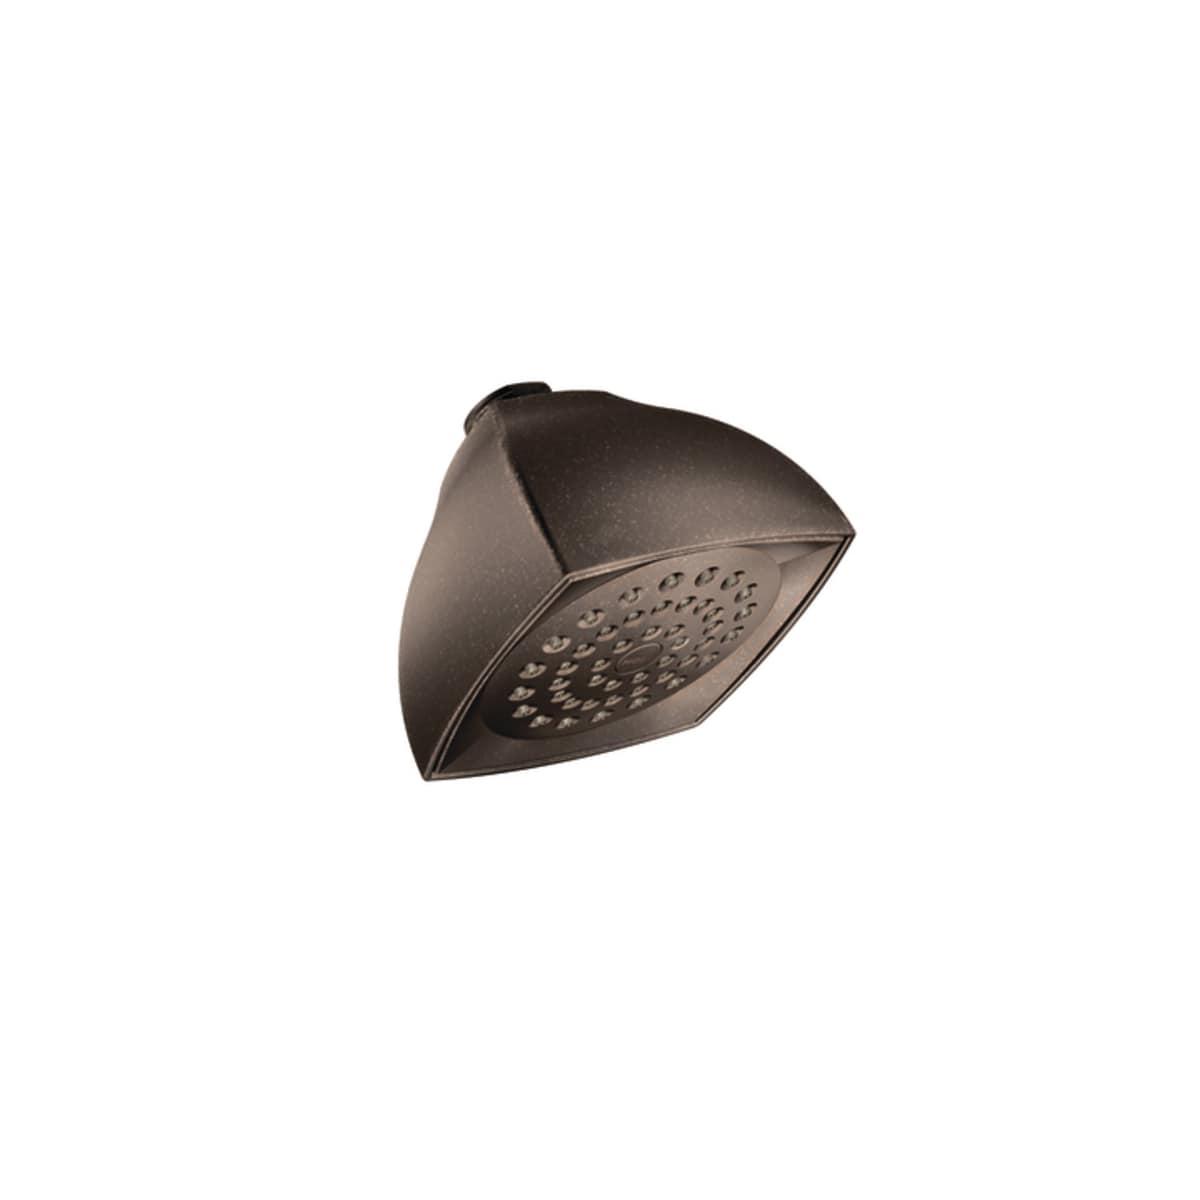 Oil Rubbed Bronze Moen Incorporated Moen 6325ORB One Function Moenflo XL Showerhead